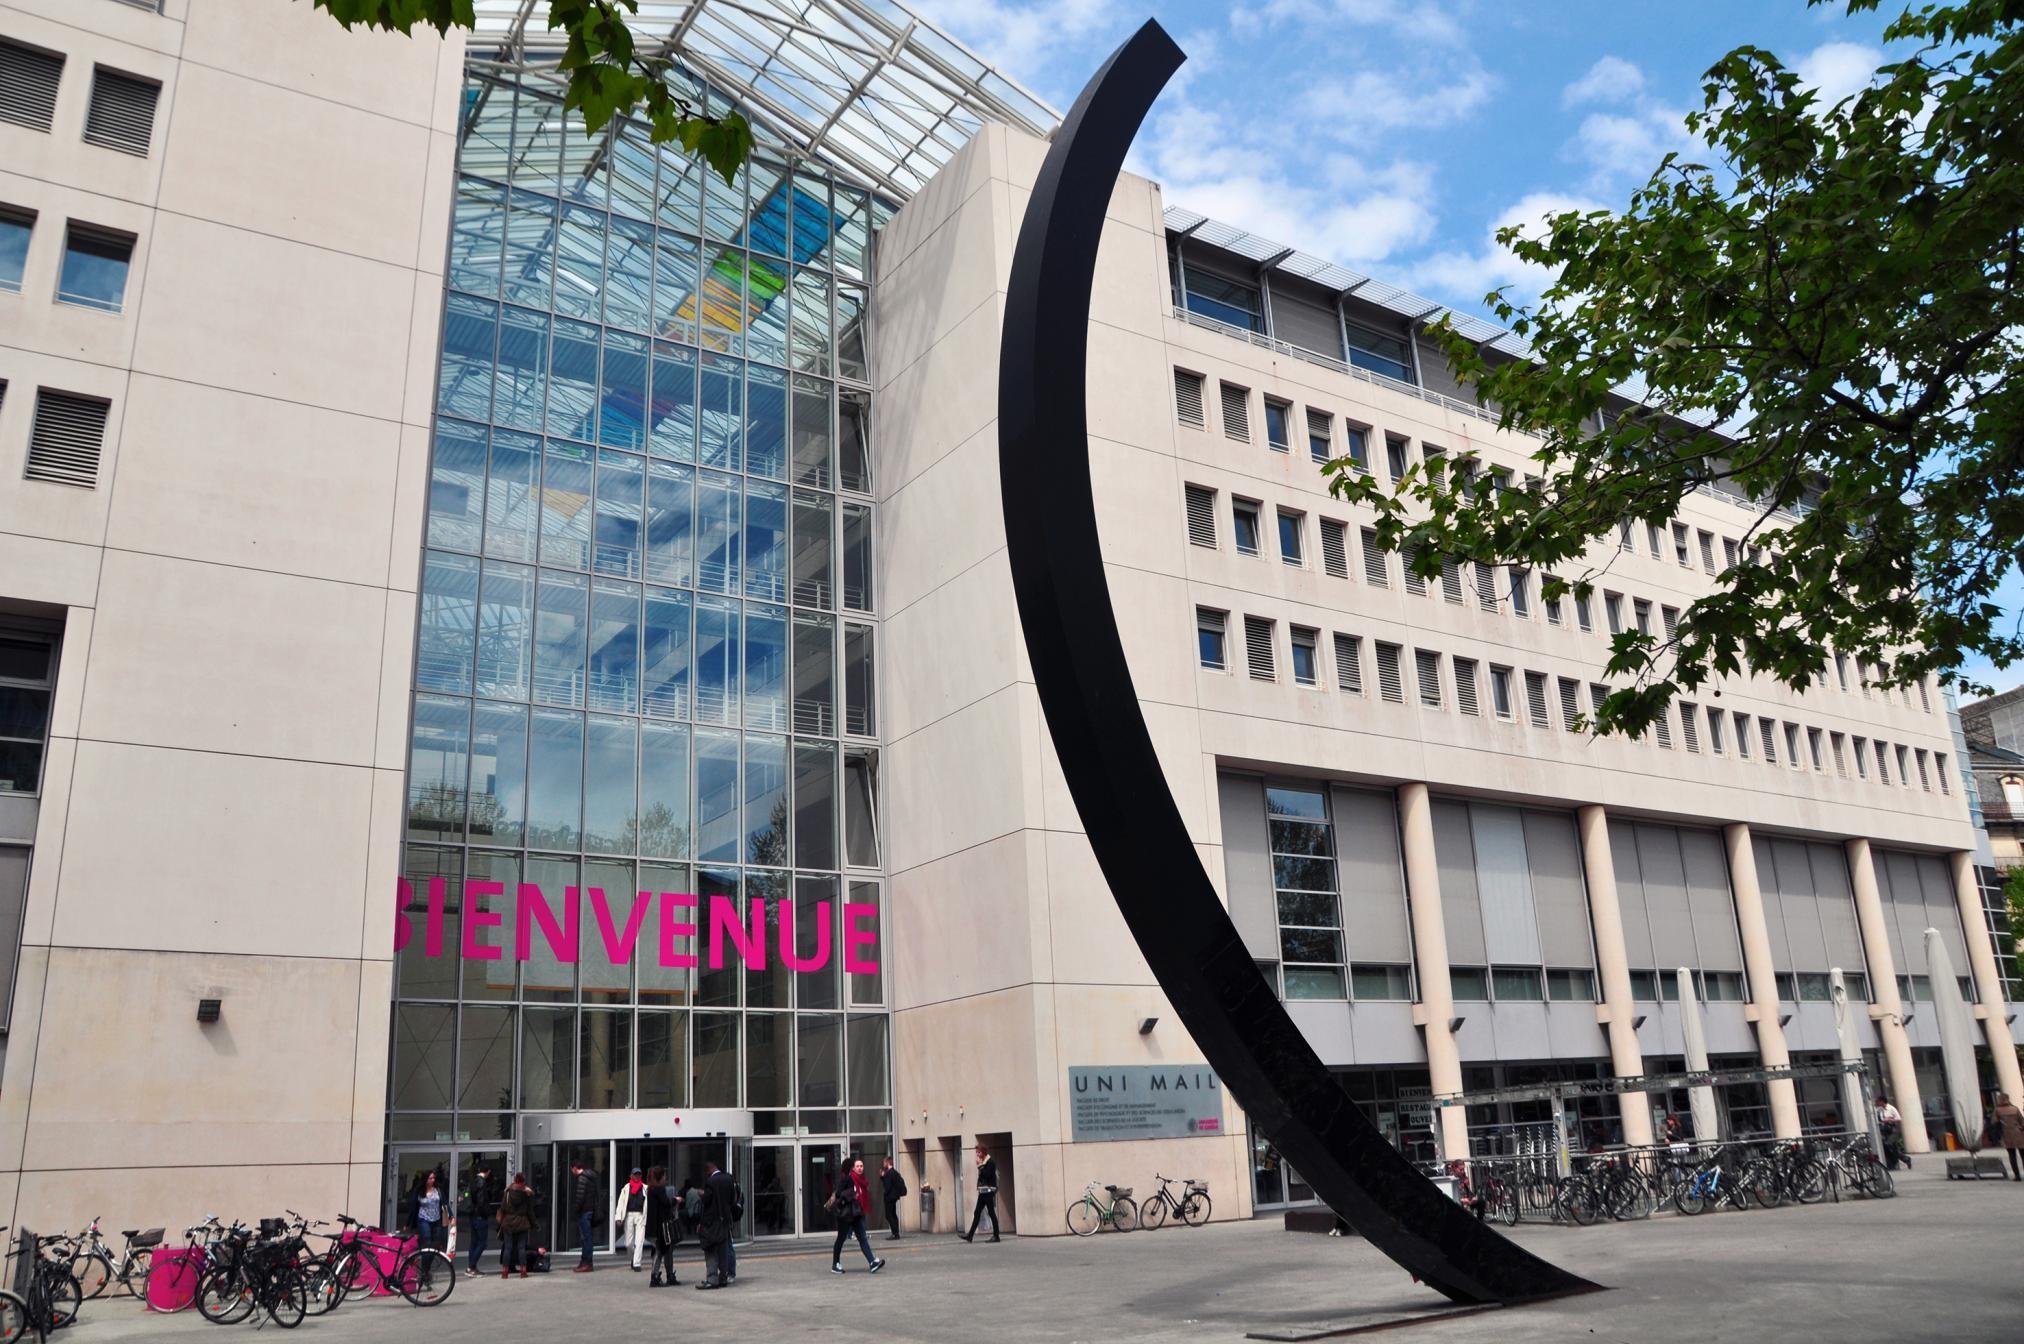 Université de Genève, Switzerland